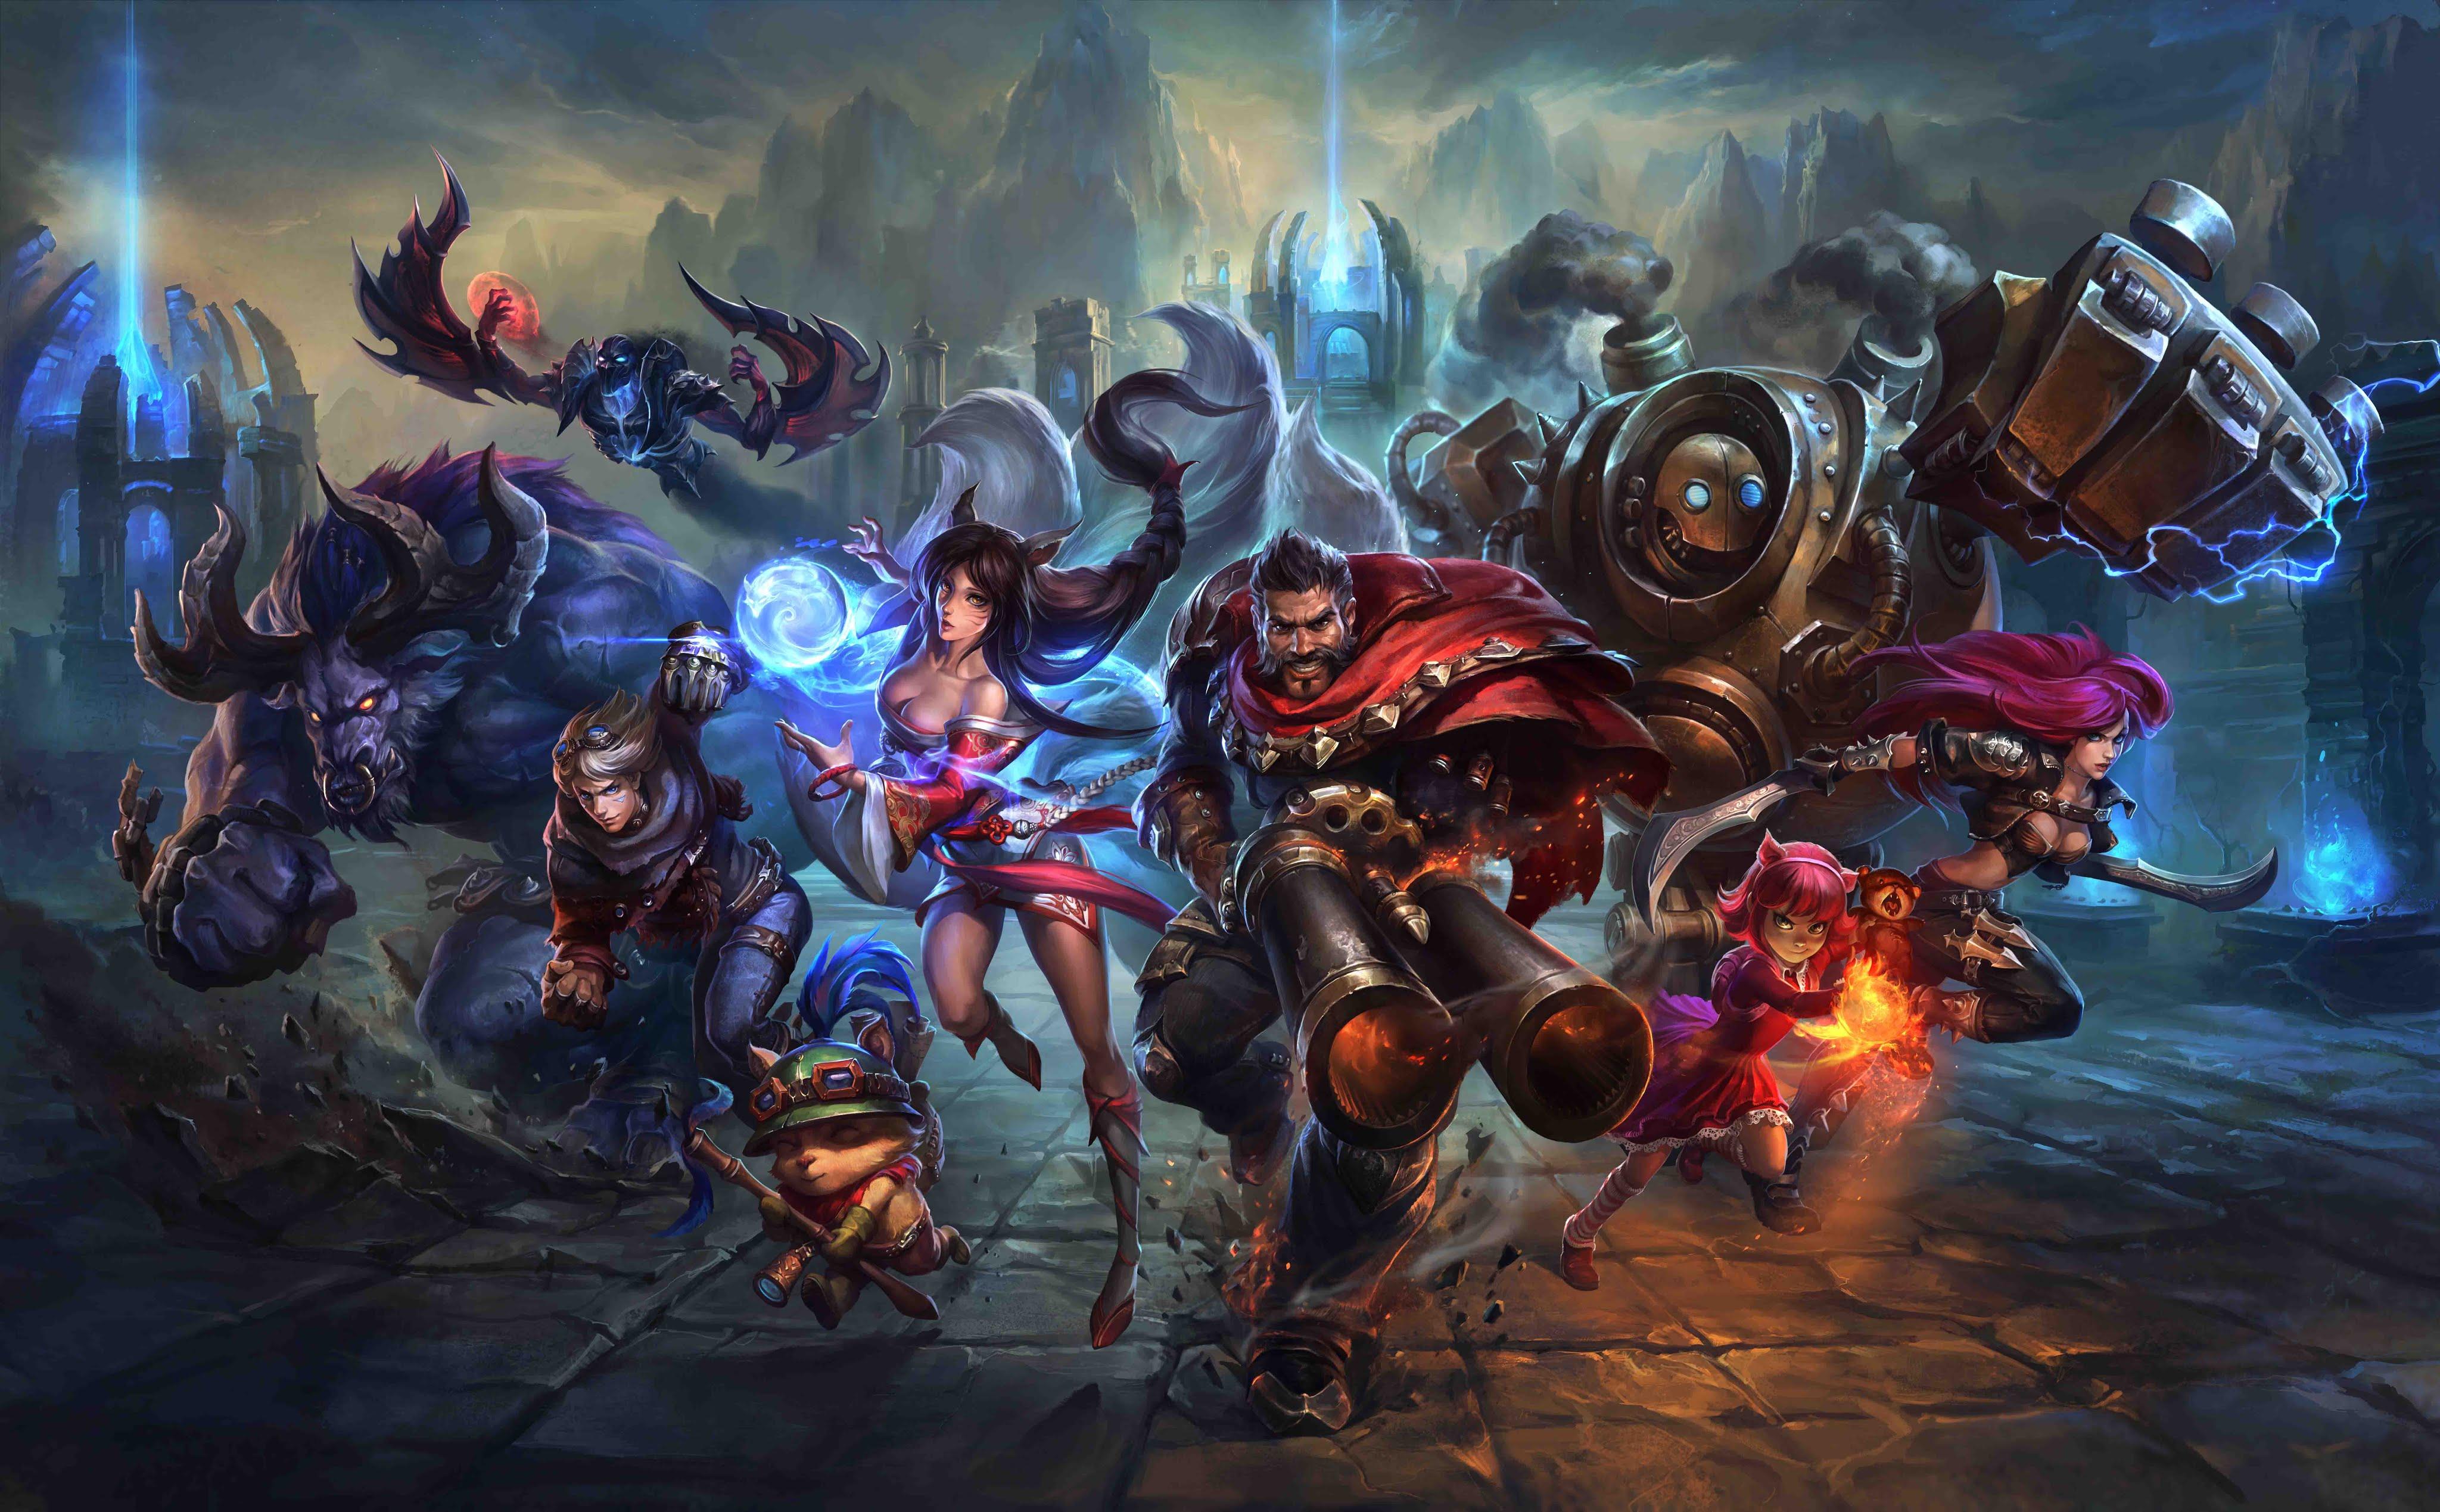 League of Legends: Intervista agli sviluppatori